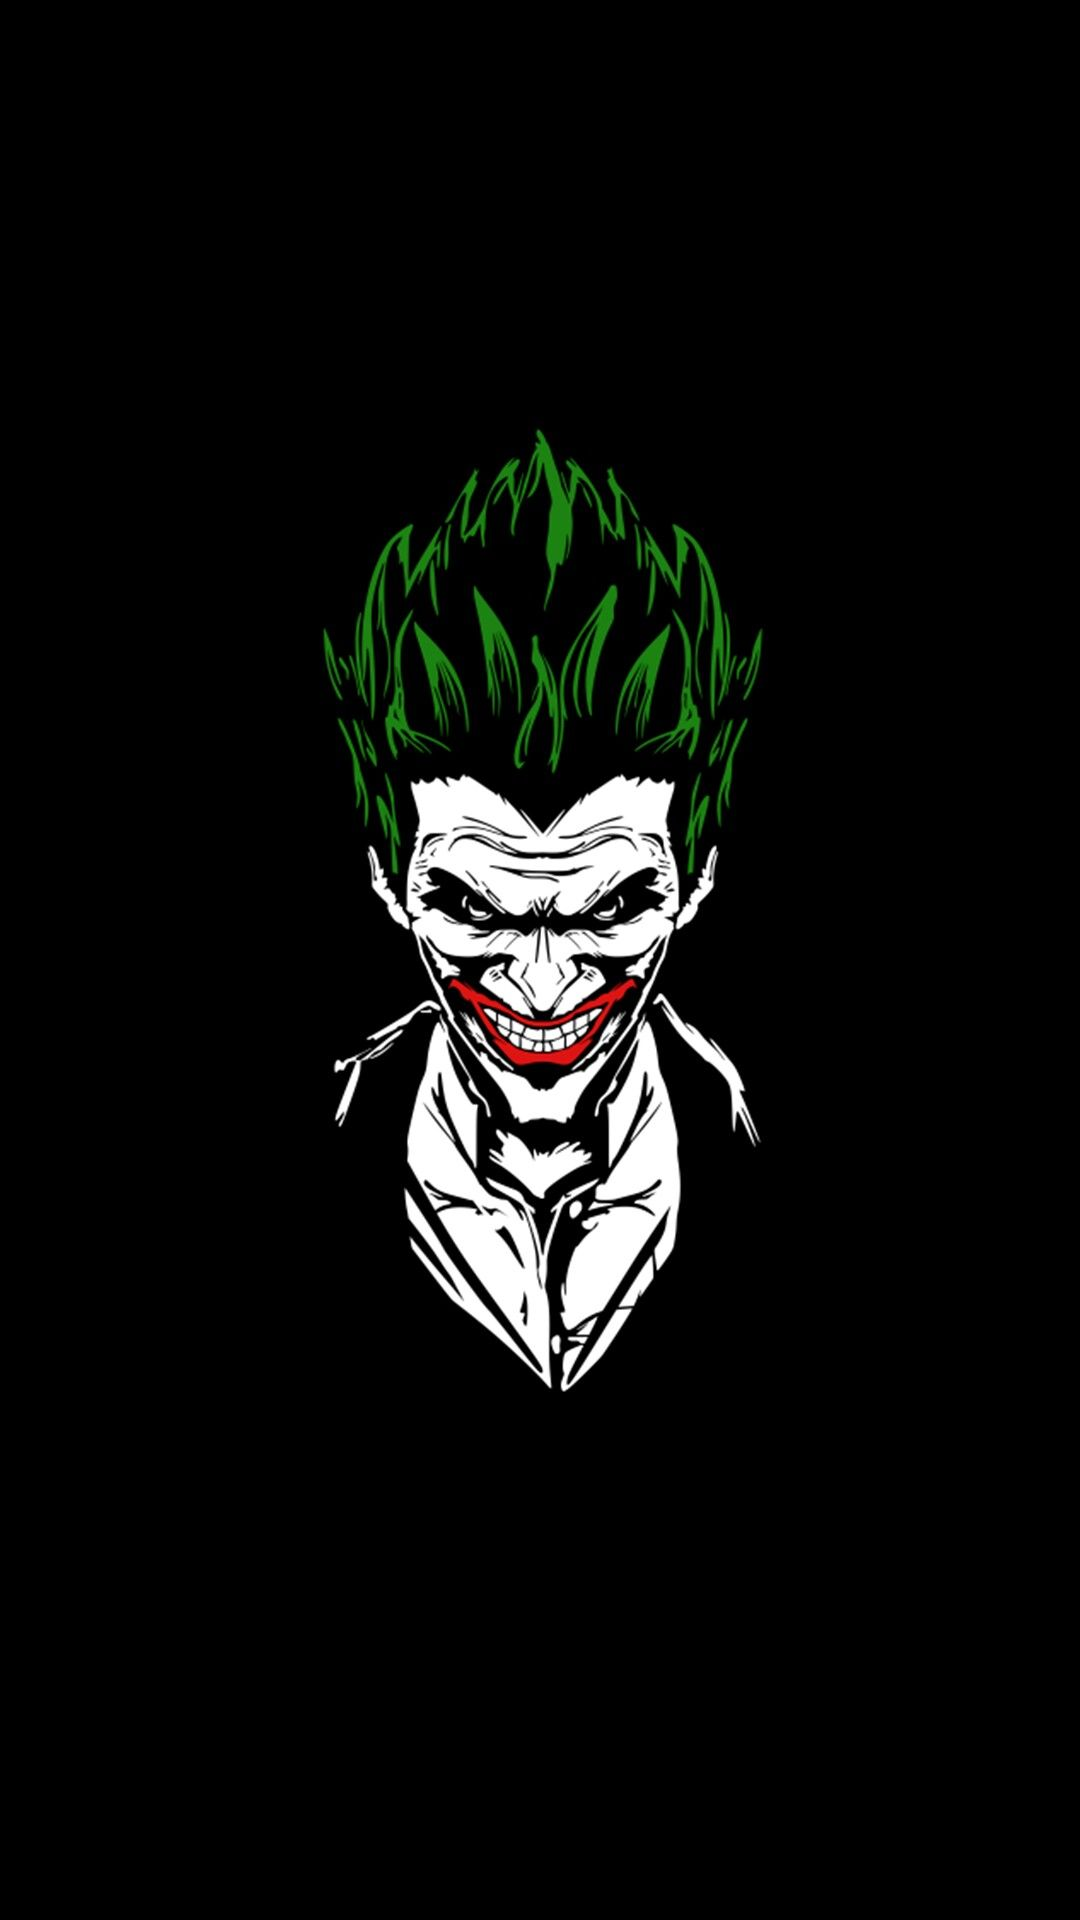 Pin By Alyssa Hall On Heroes Villains Joker Cartoon Joker